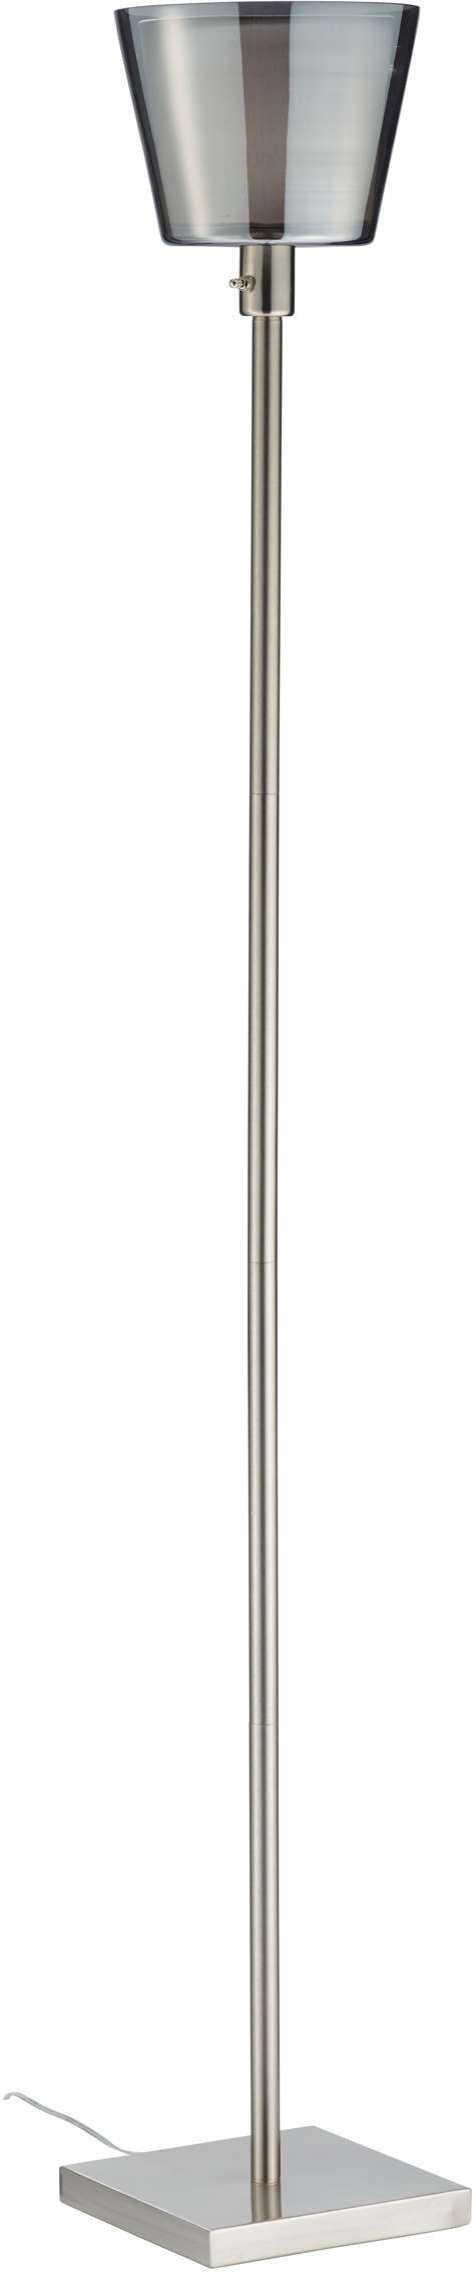 Prescott Tall Floor Lamp Tall Floor Lamps Brushed Steel Lamp Torchiere Floor Lamp